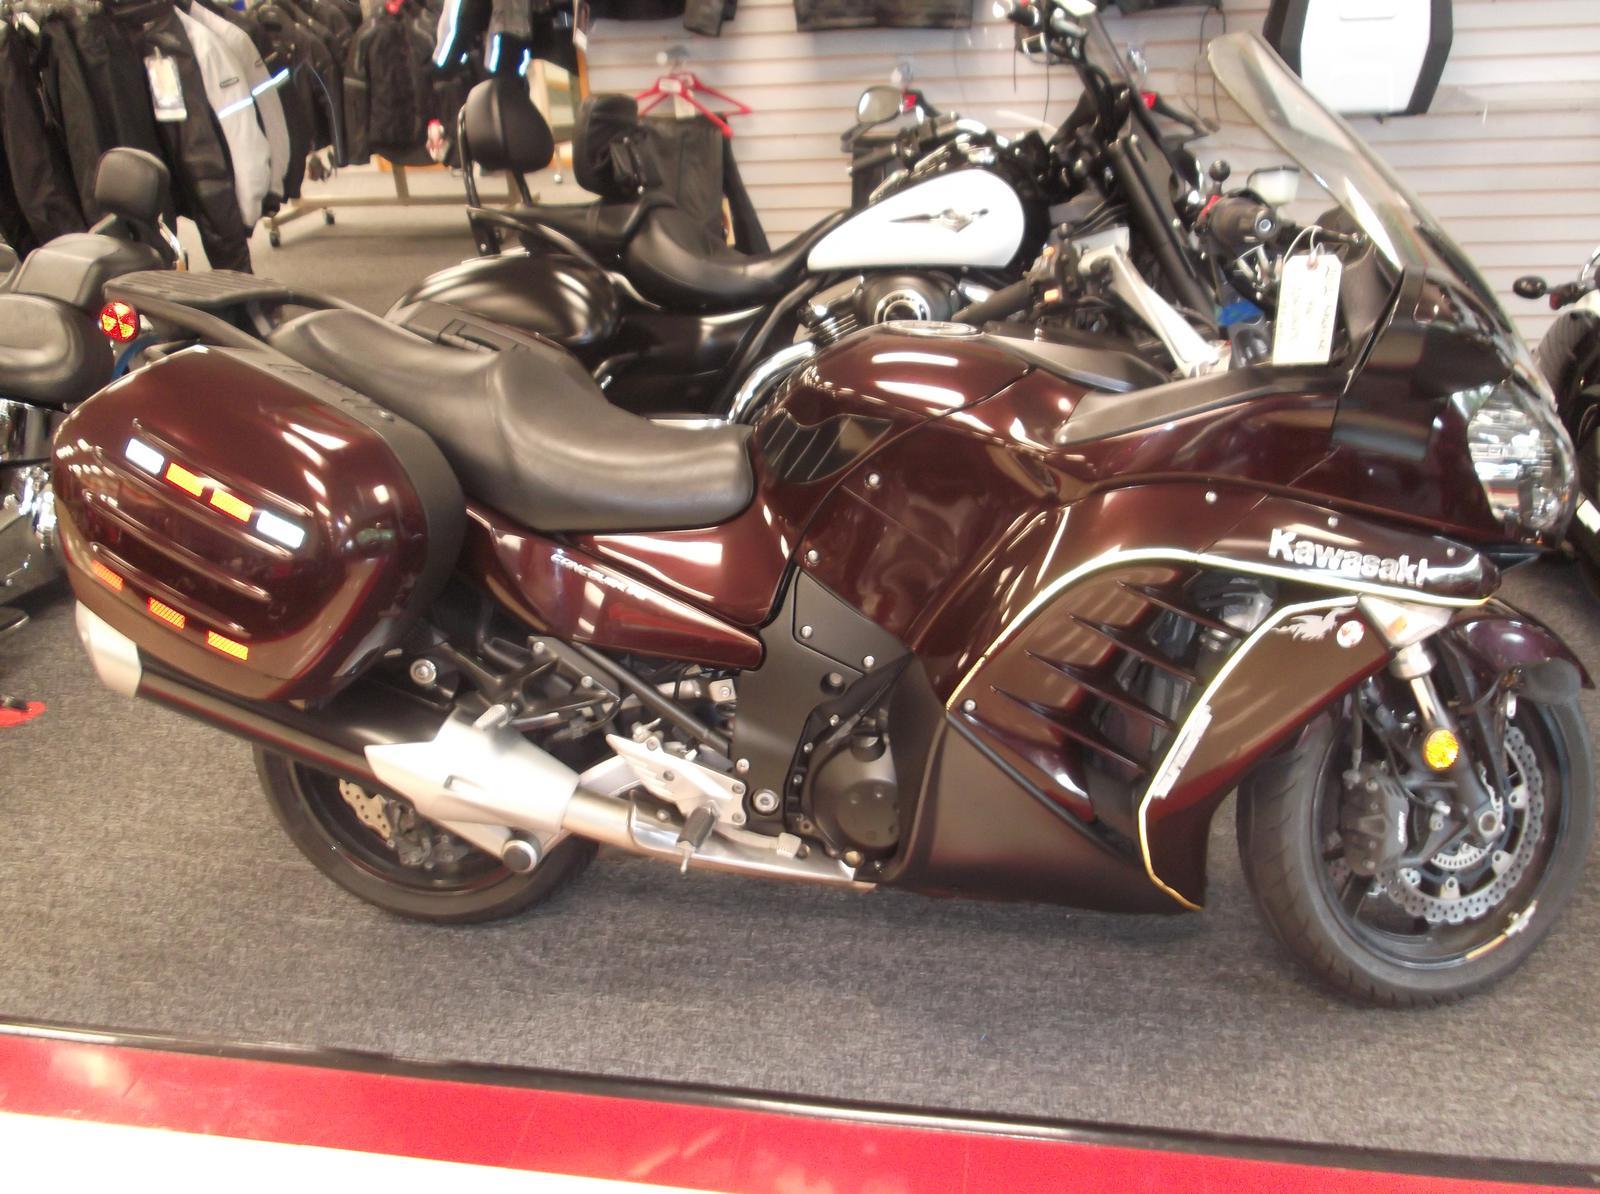 2012 Kawasaki Concours 1400